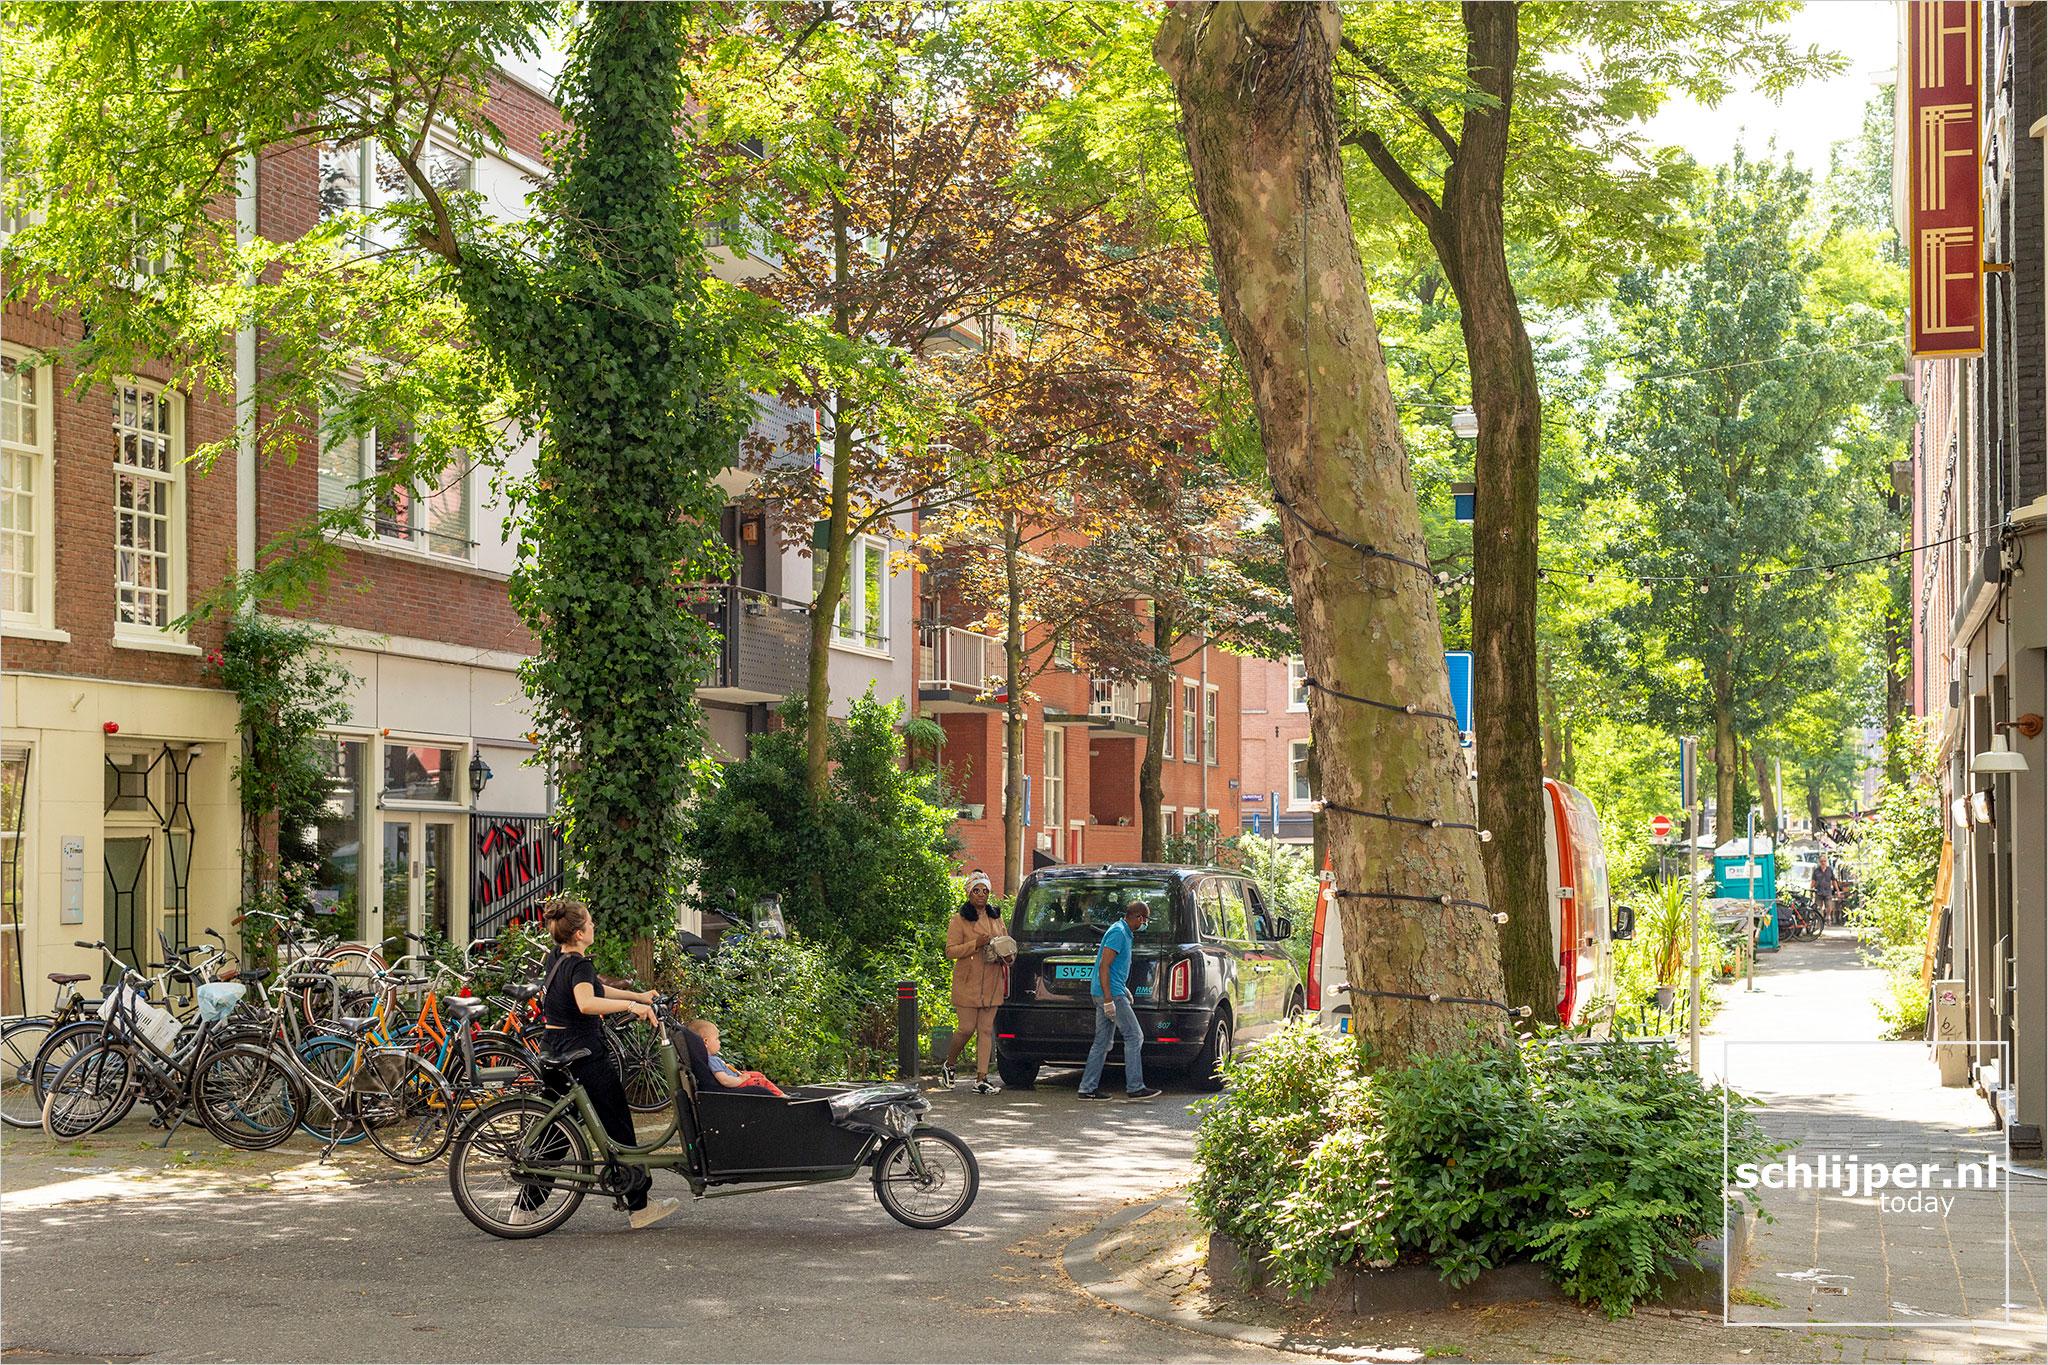 The Netherlands, Amsterdam, 8 juli 2021